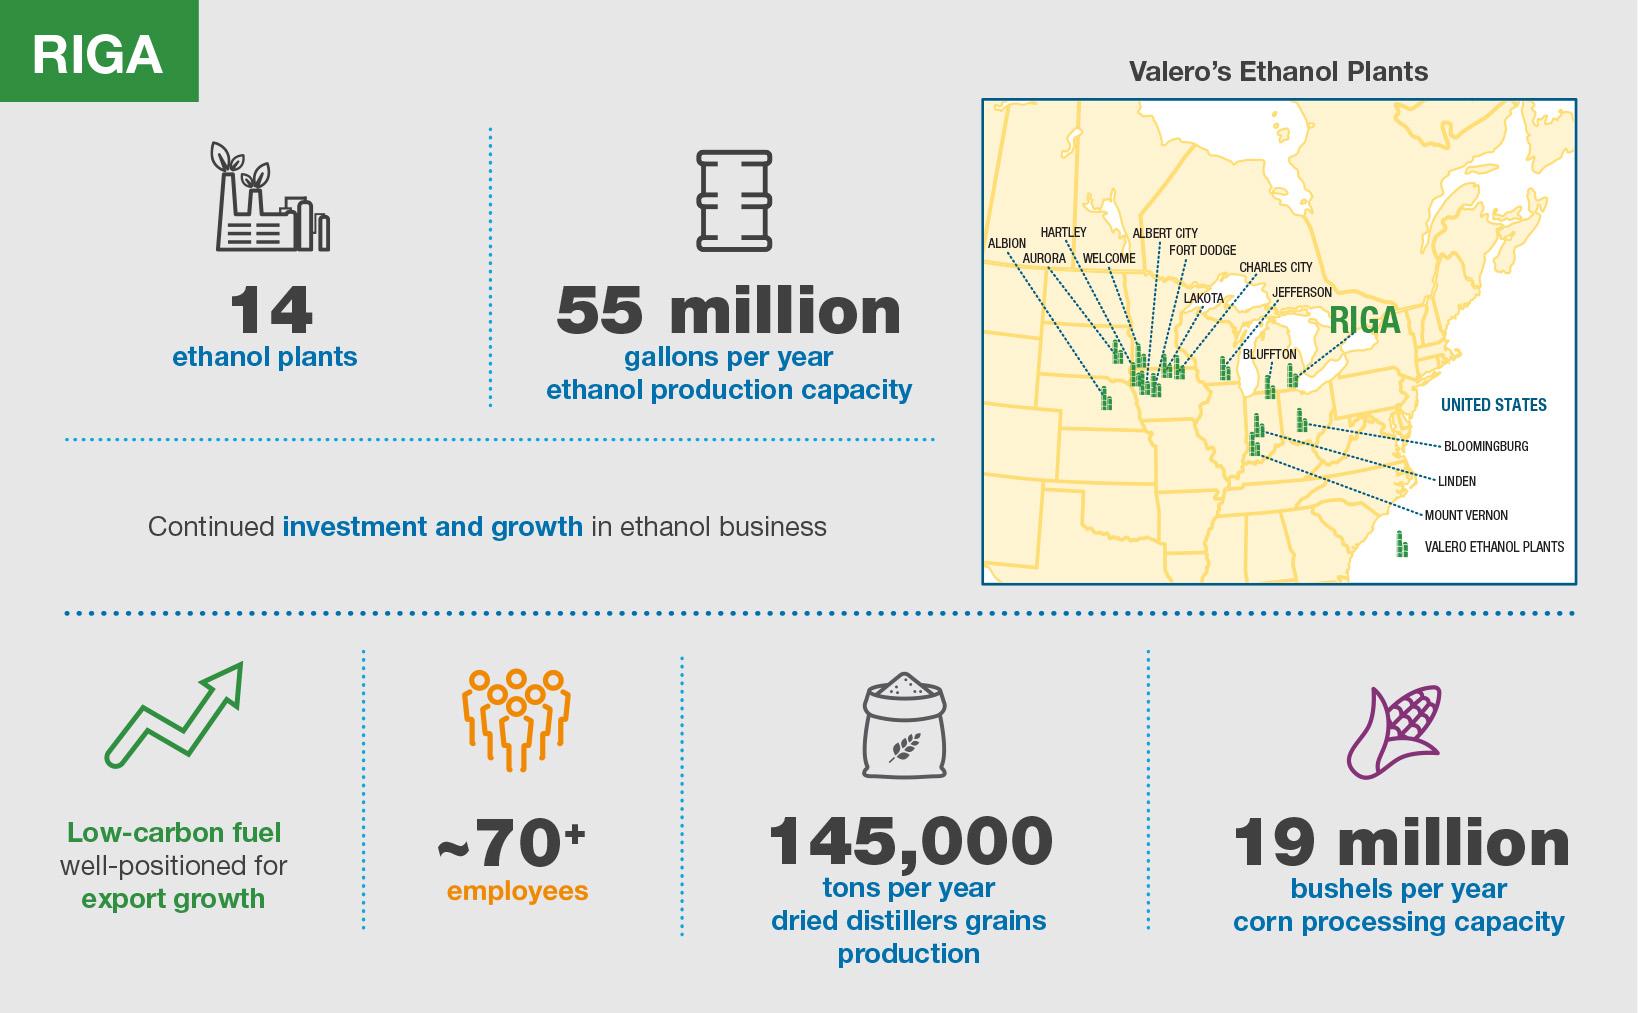 Valero Riga Ethanol Plant Infographic